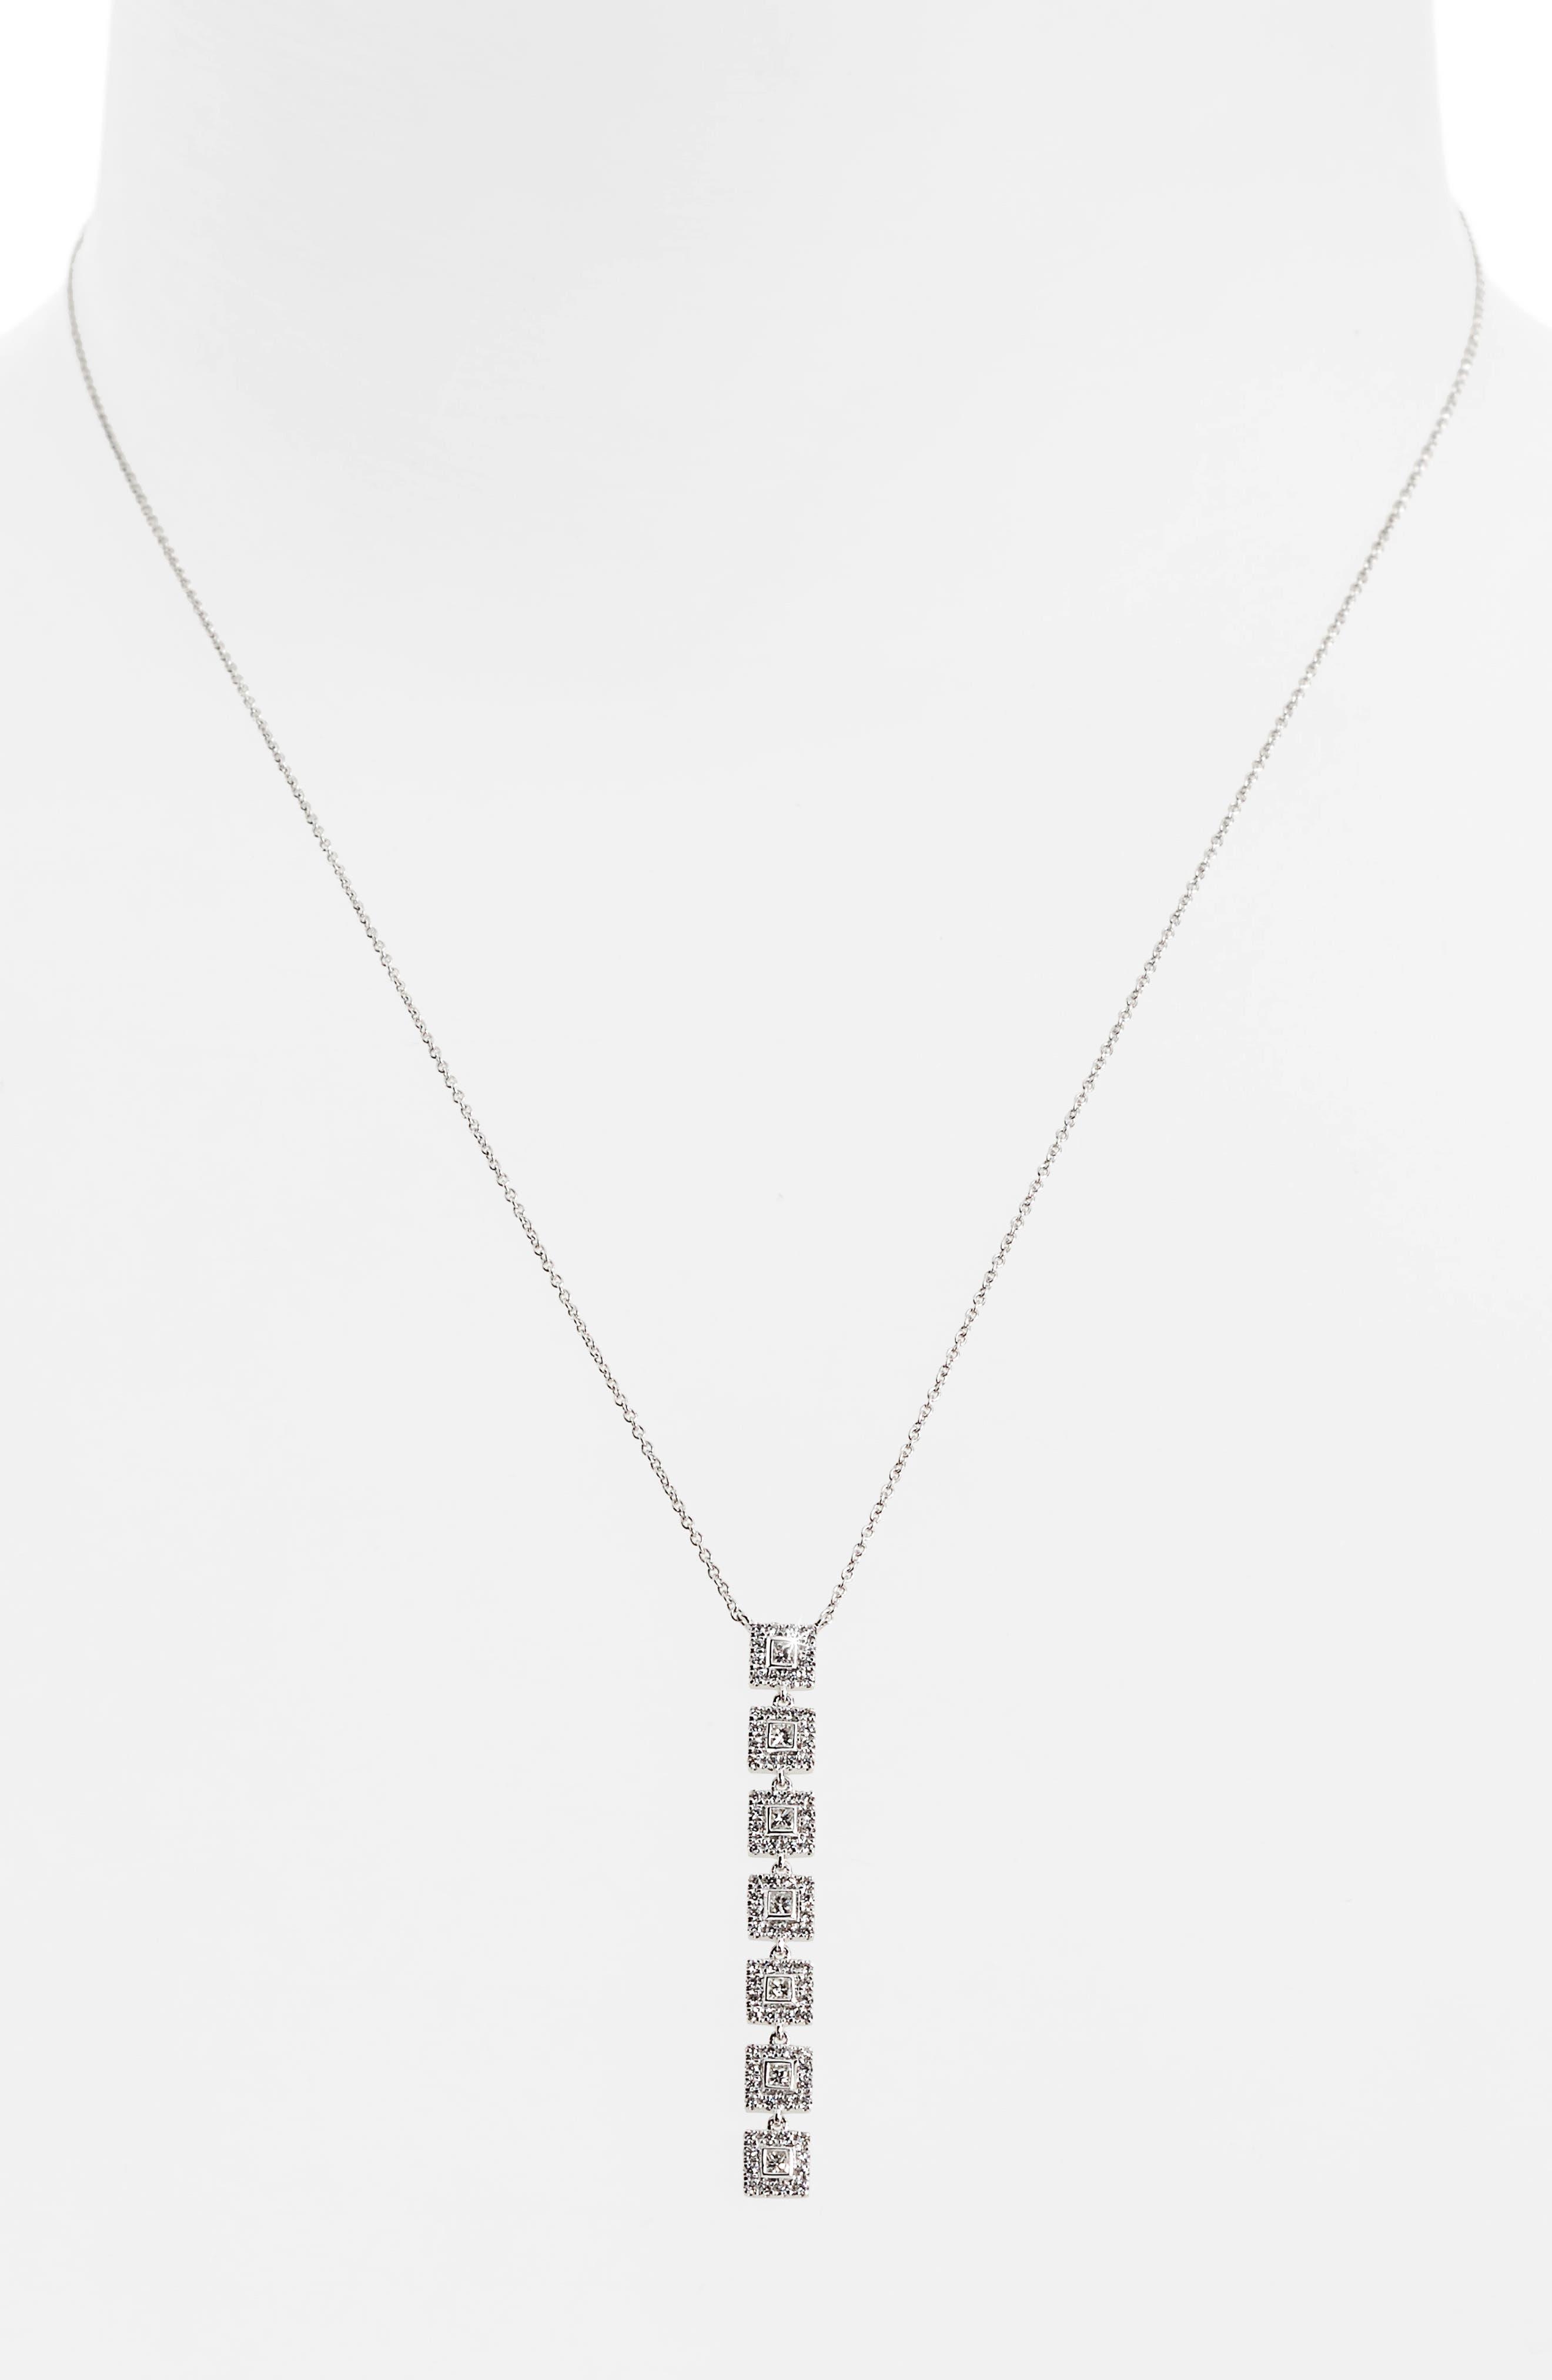 Amara Diamond Pendant Necklace,                             Alternate thumbnail 2, color,                             WHITE GOLD